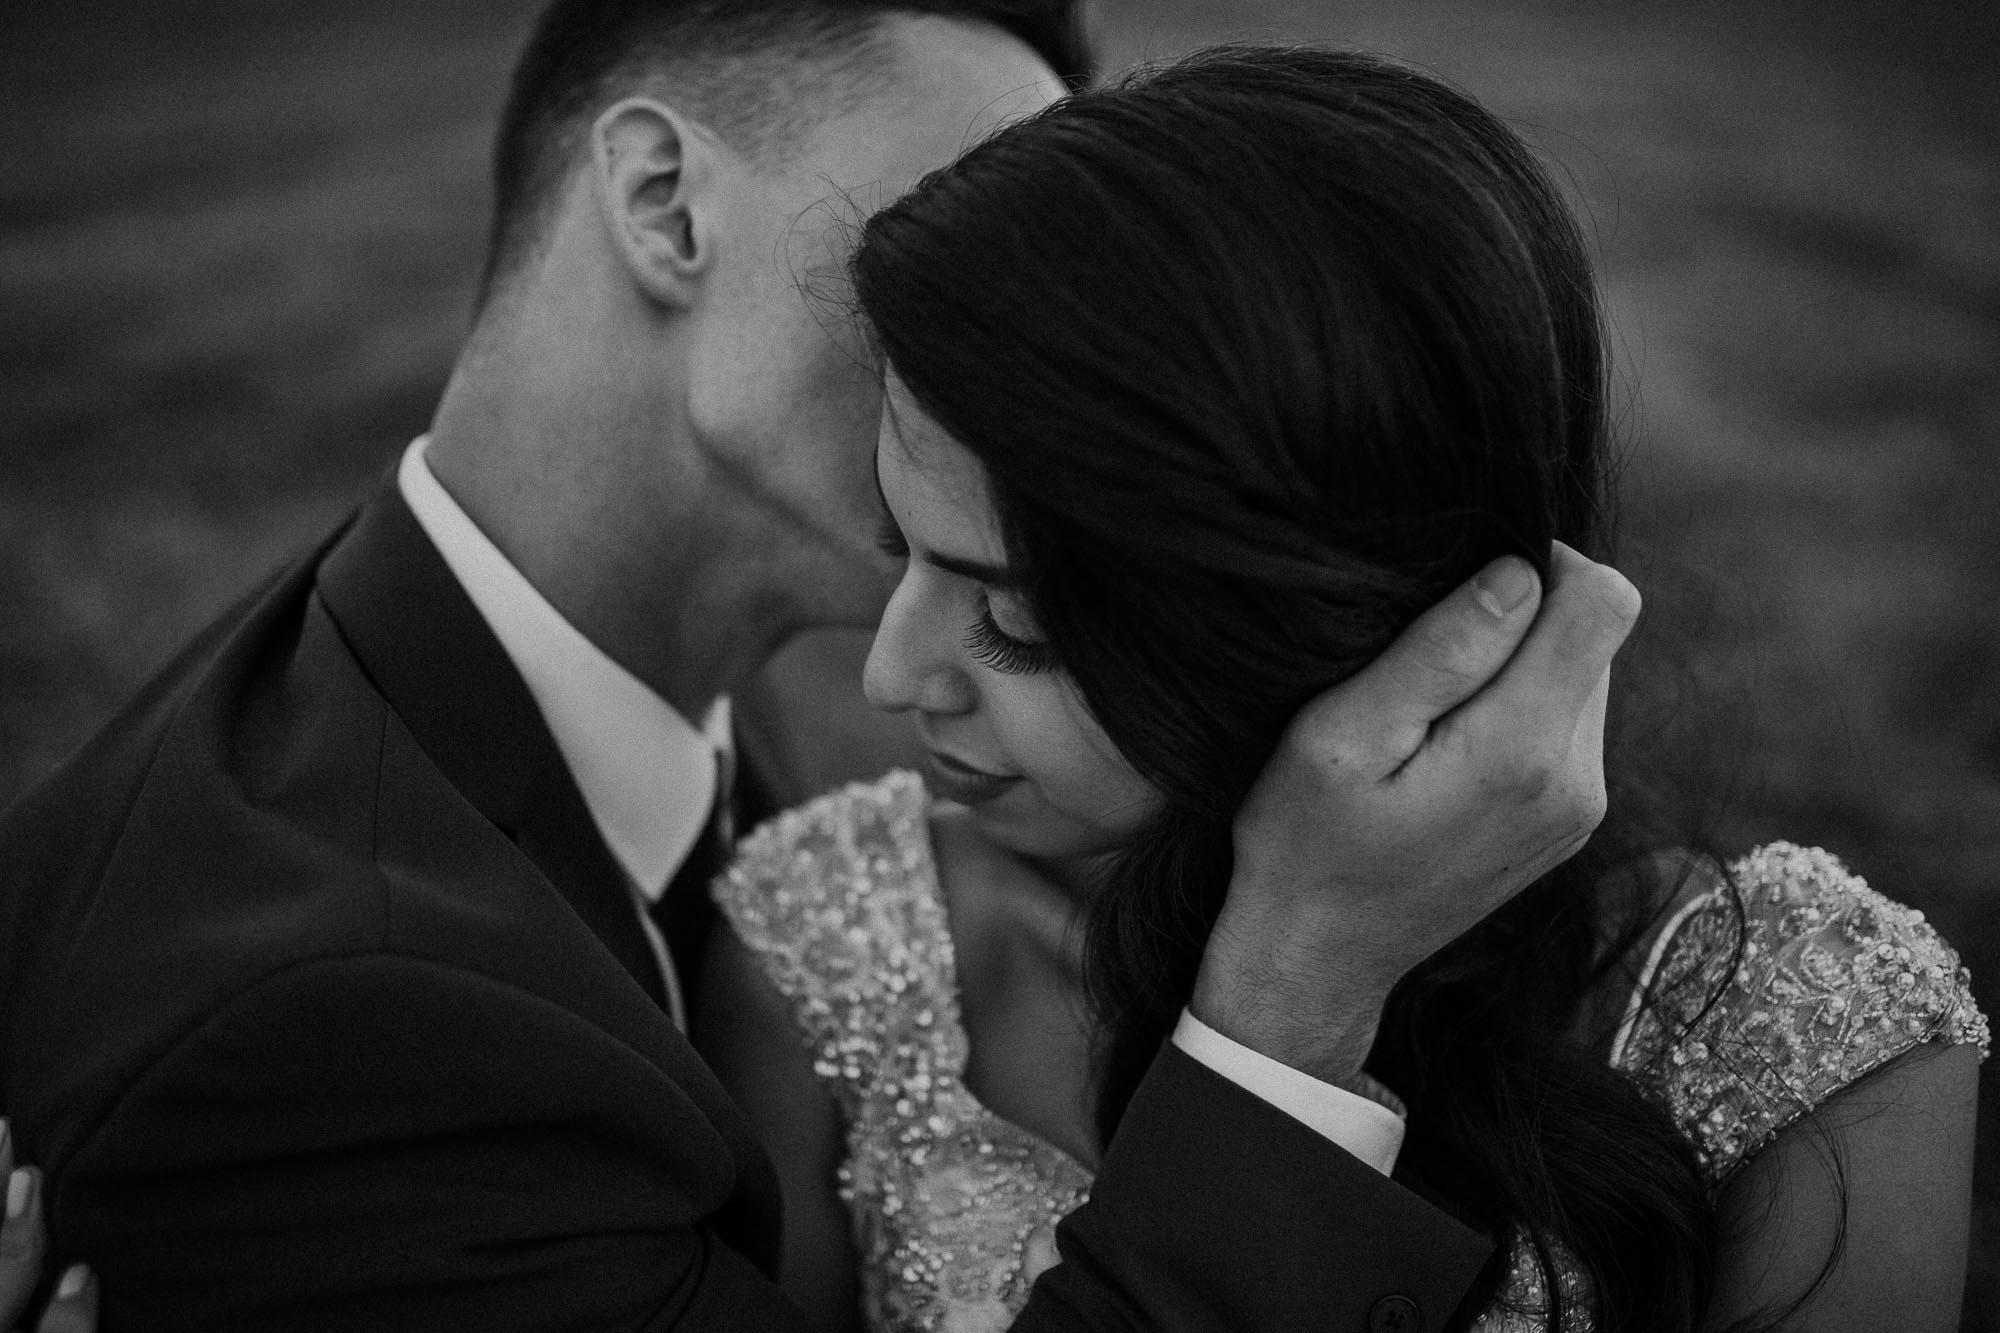 champaign_il_wedding_photography-0898.jpg